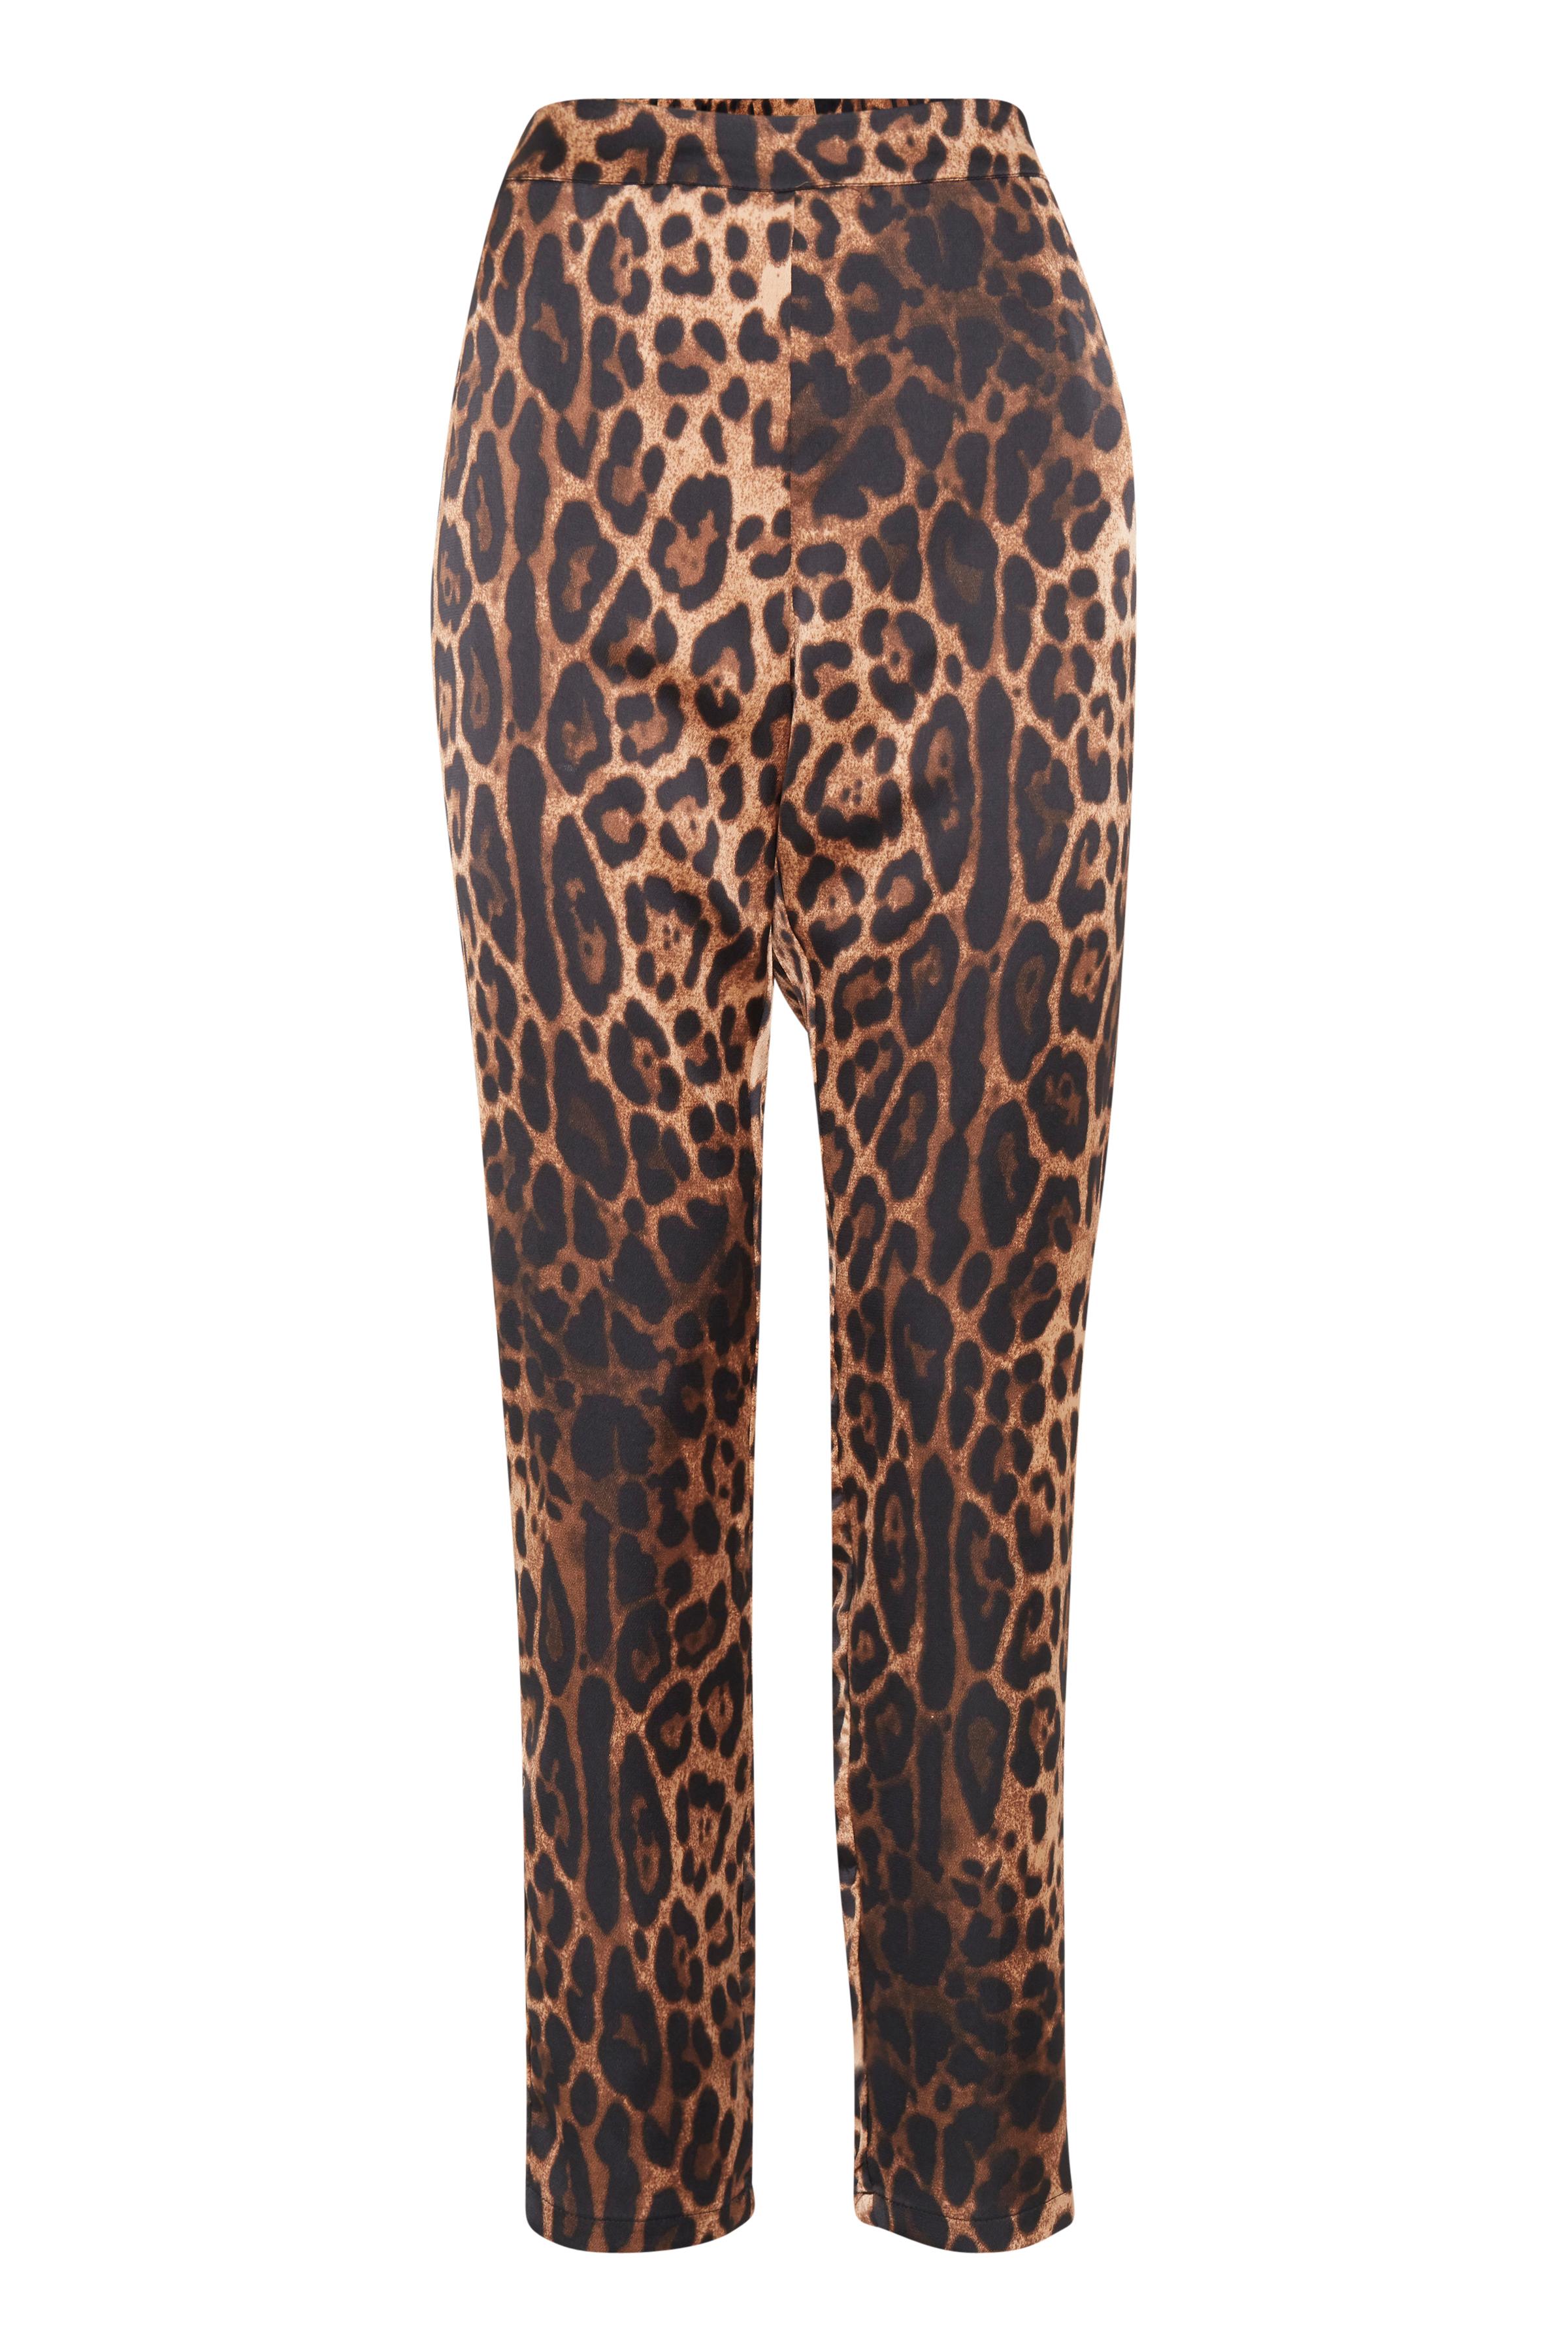 Golden combi 1 Pants Casual fra b.young – Køb Golden combi 1 Pants Casual fra str. 34-42 her